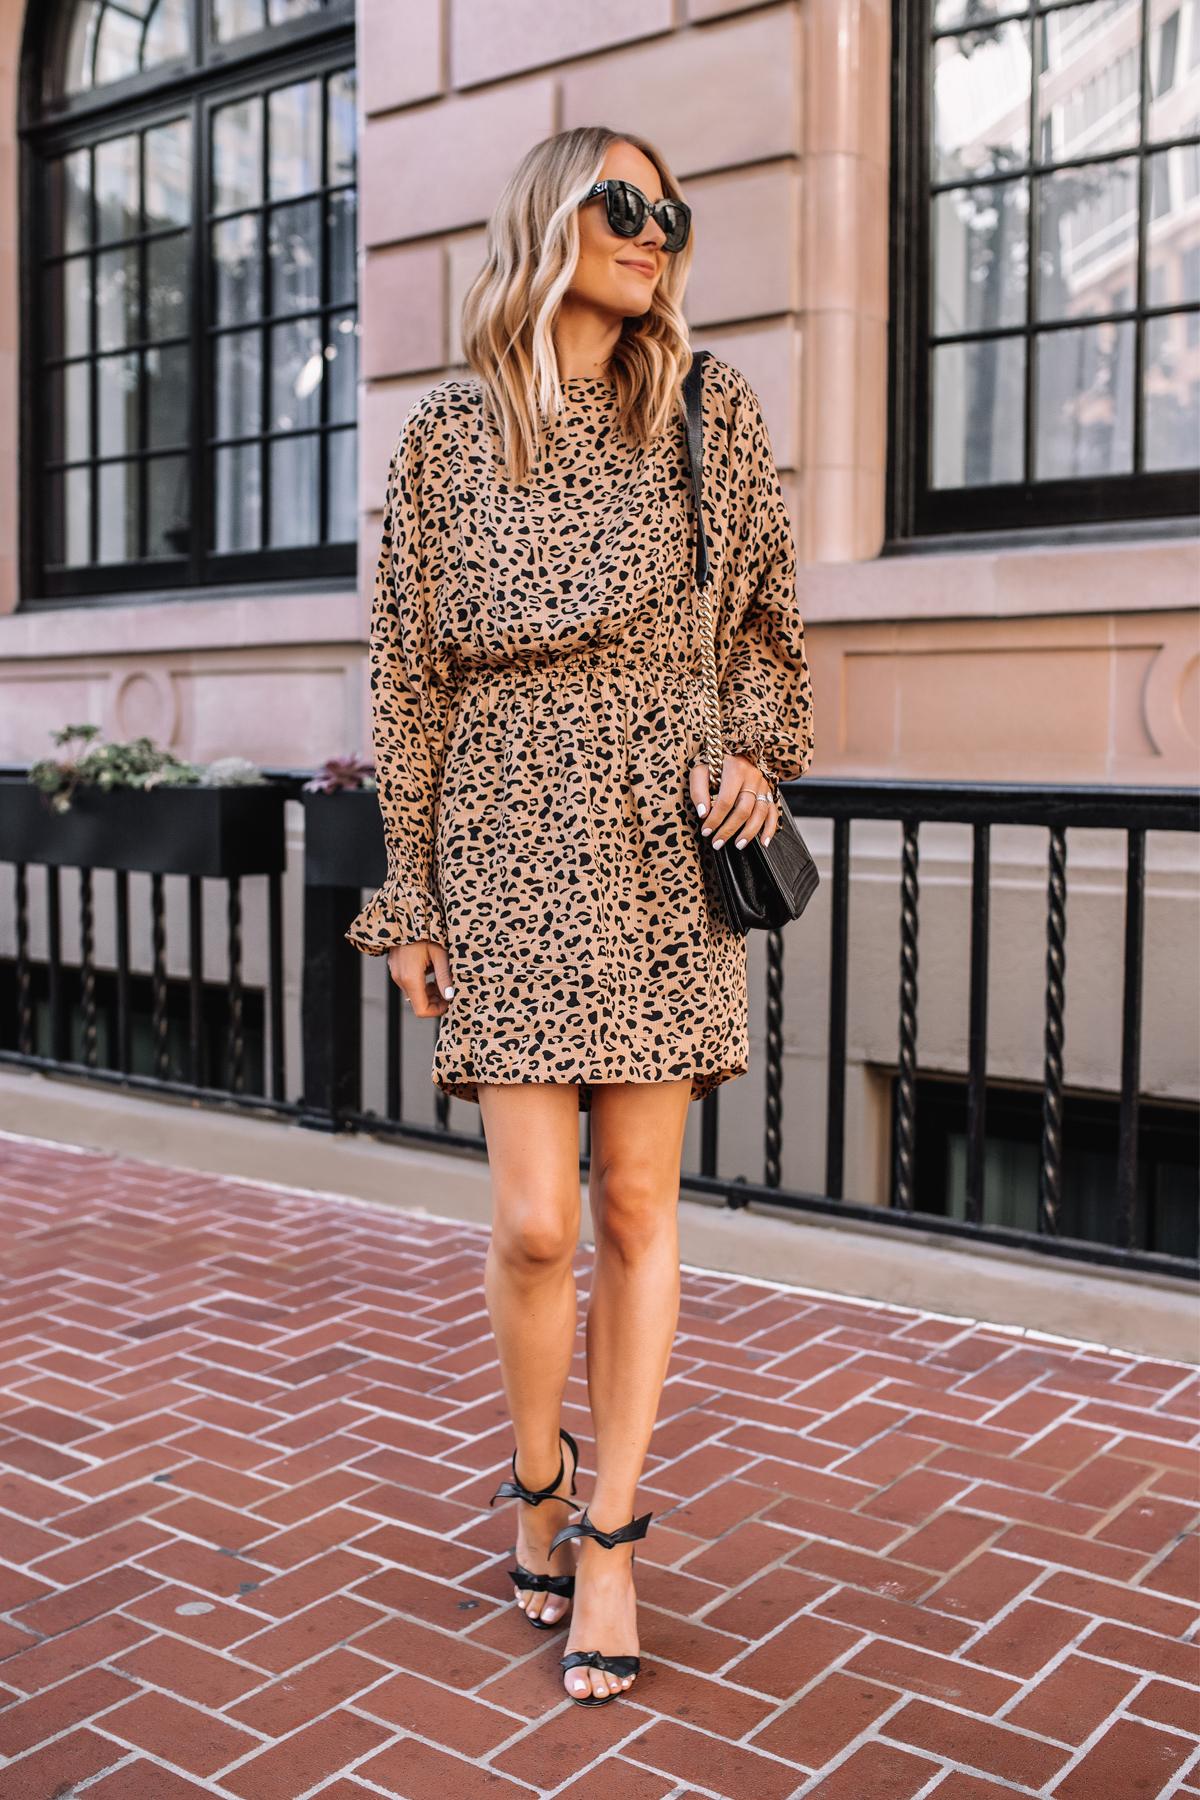 Fashion Jackson Wearing Leopard Mini Dress Black Heeled Sandals